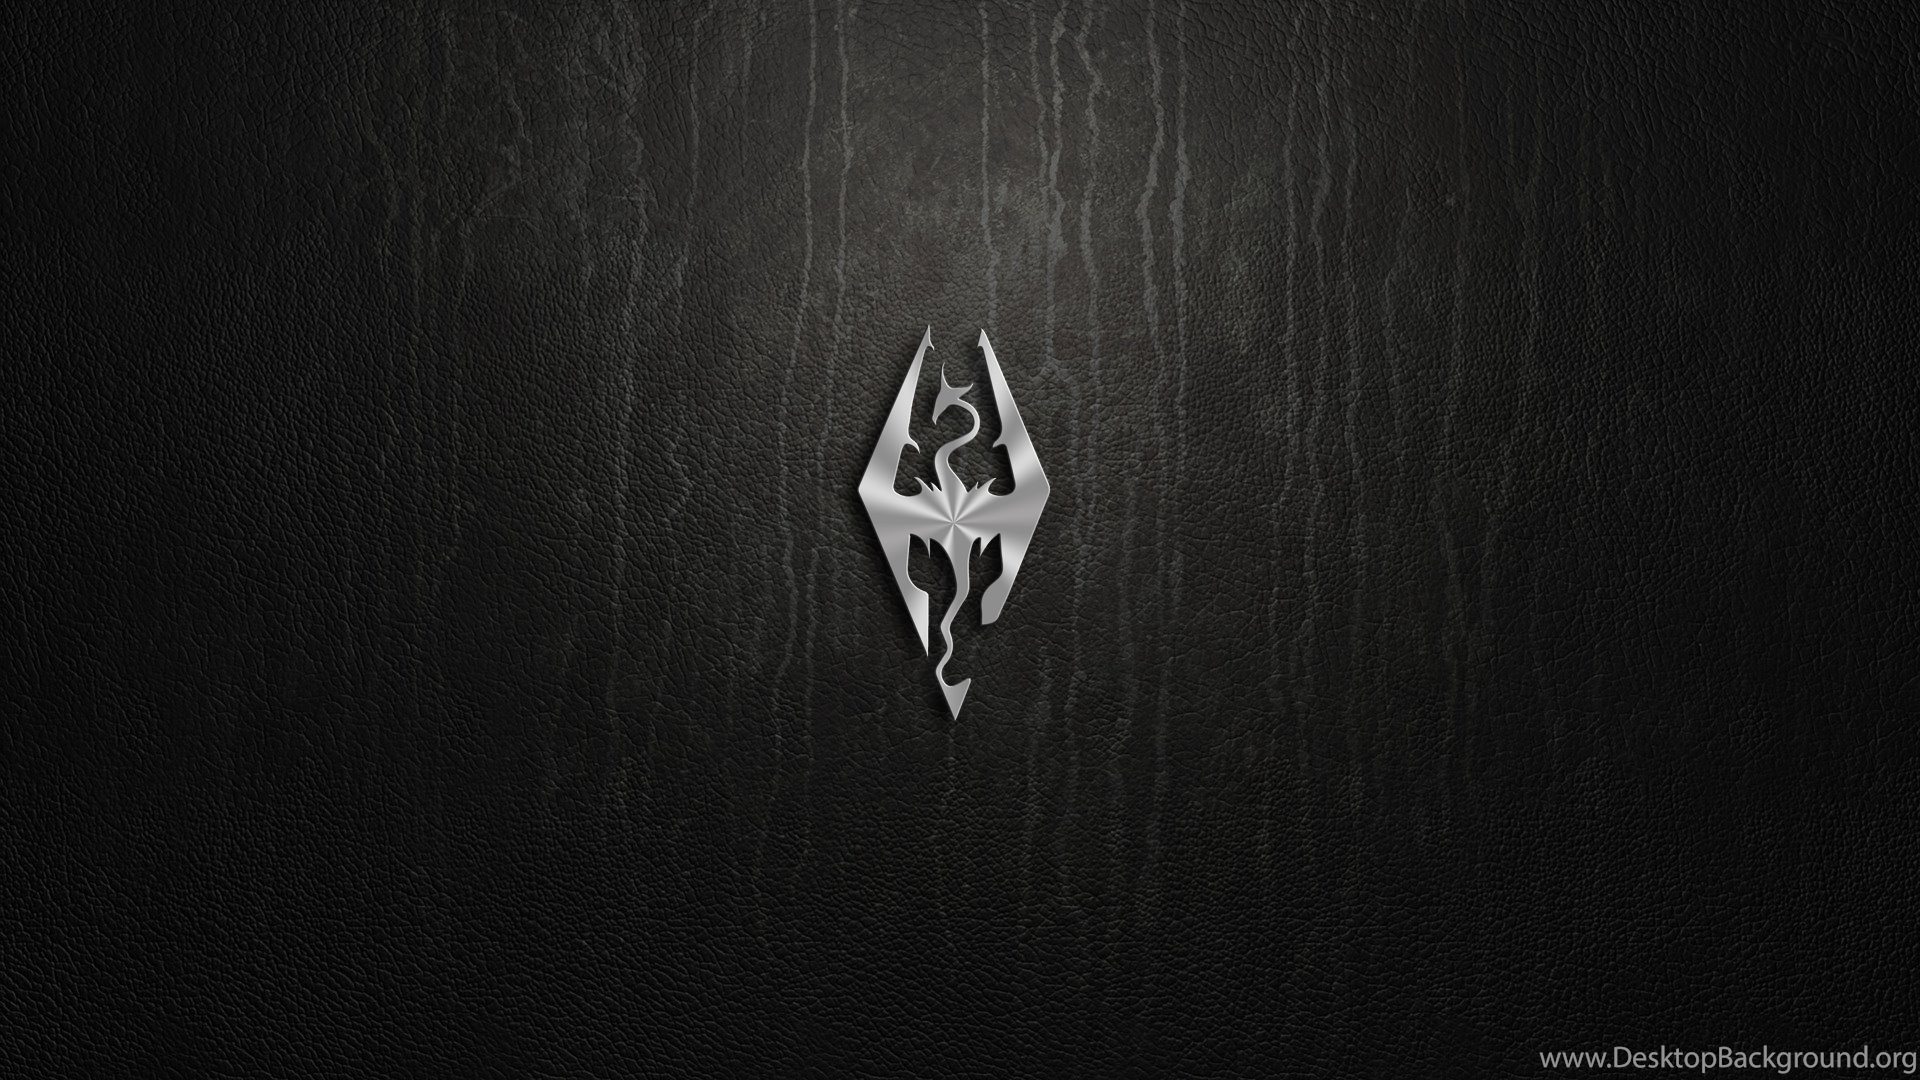 The Elder Scrolls V Skyrim Wallpaper Images Photos Pictures